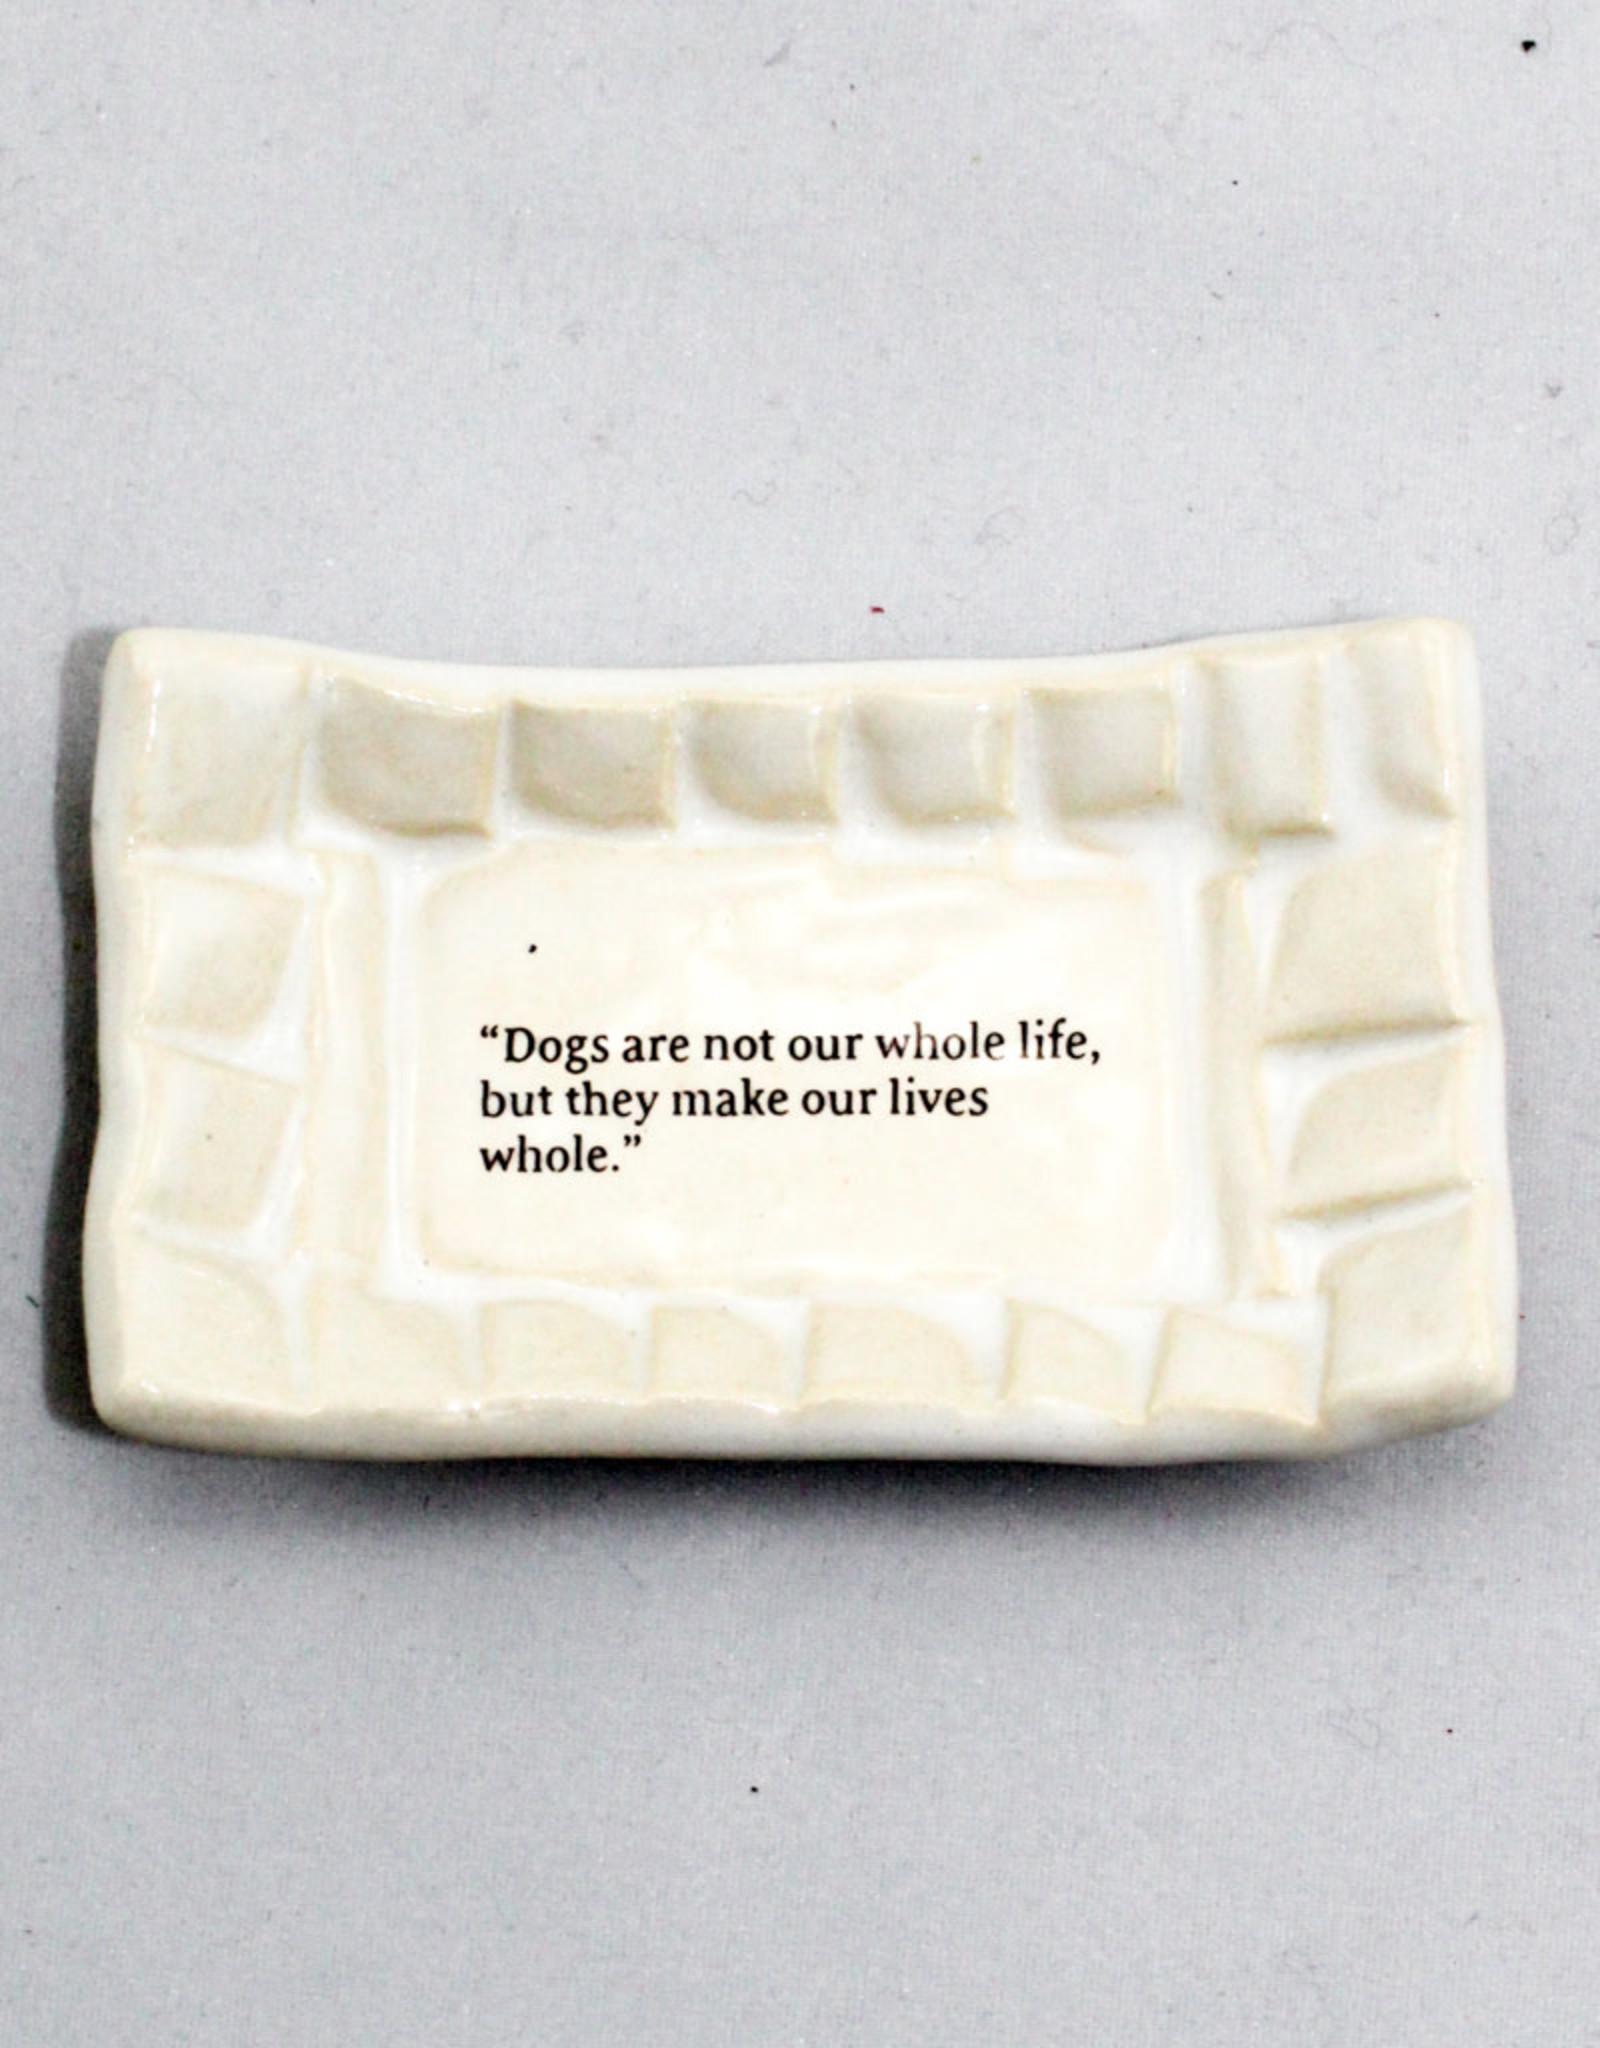 Lorraine Oerth & Co. Quotes Dish